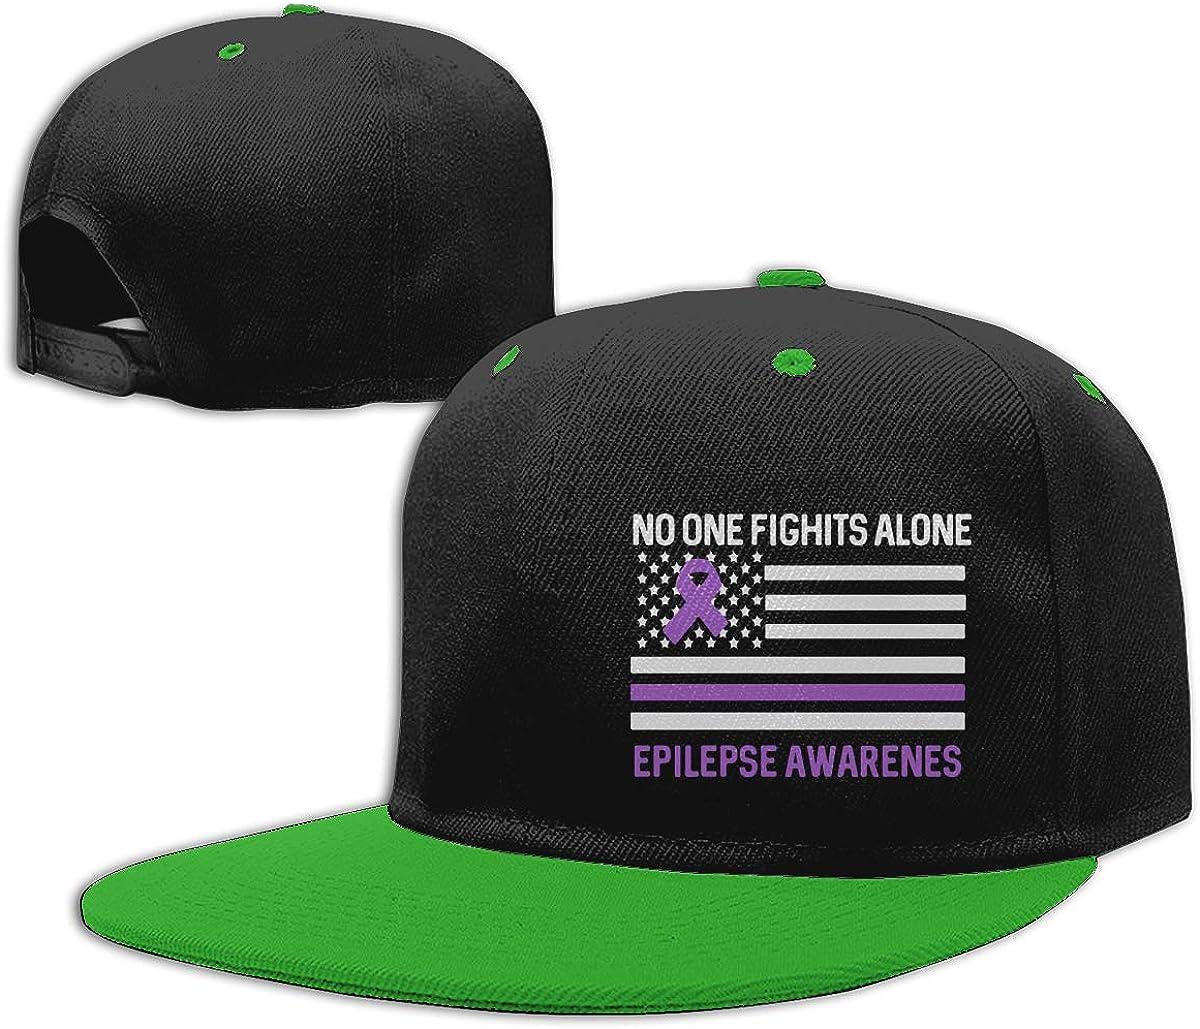 Epilepsy Awareness Fashion Flat Bill Baseball Caps NMG-01 Men Womens Hiphop Cap